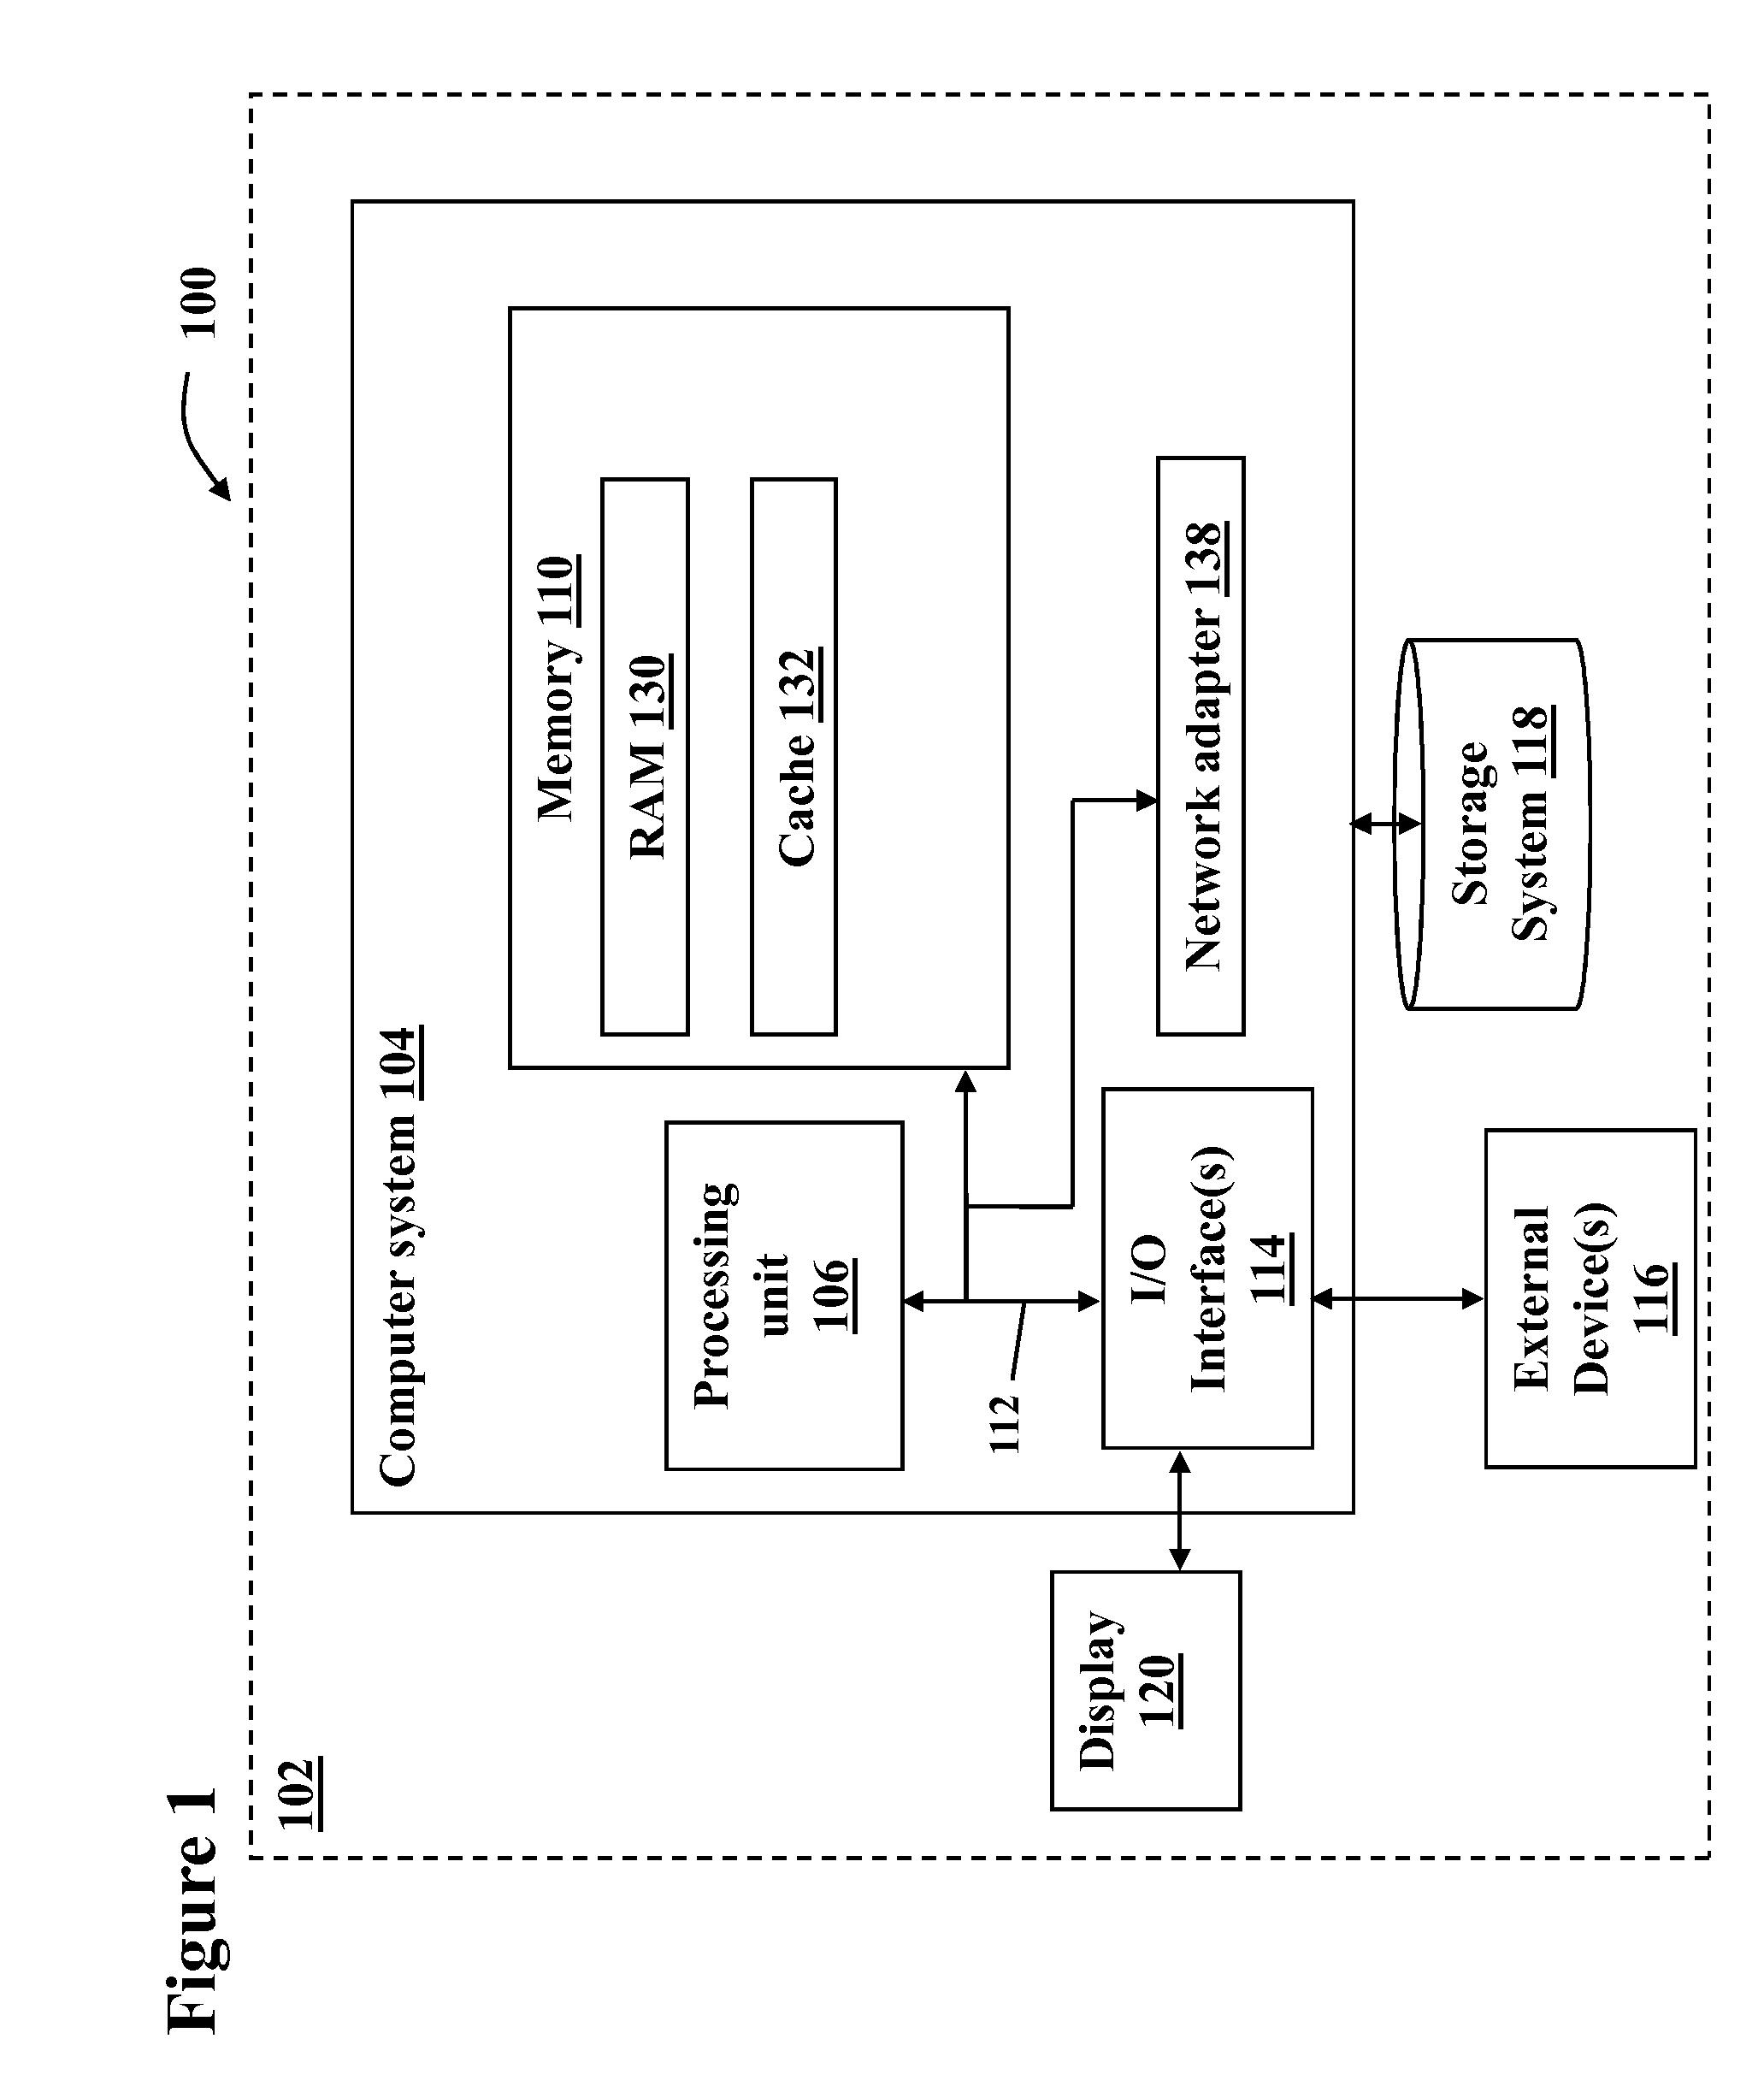 Patent US8656476 - Providing notification of spam avatars